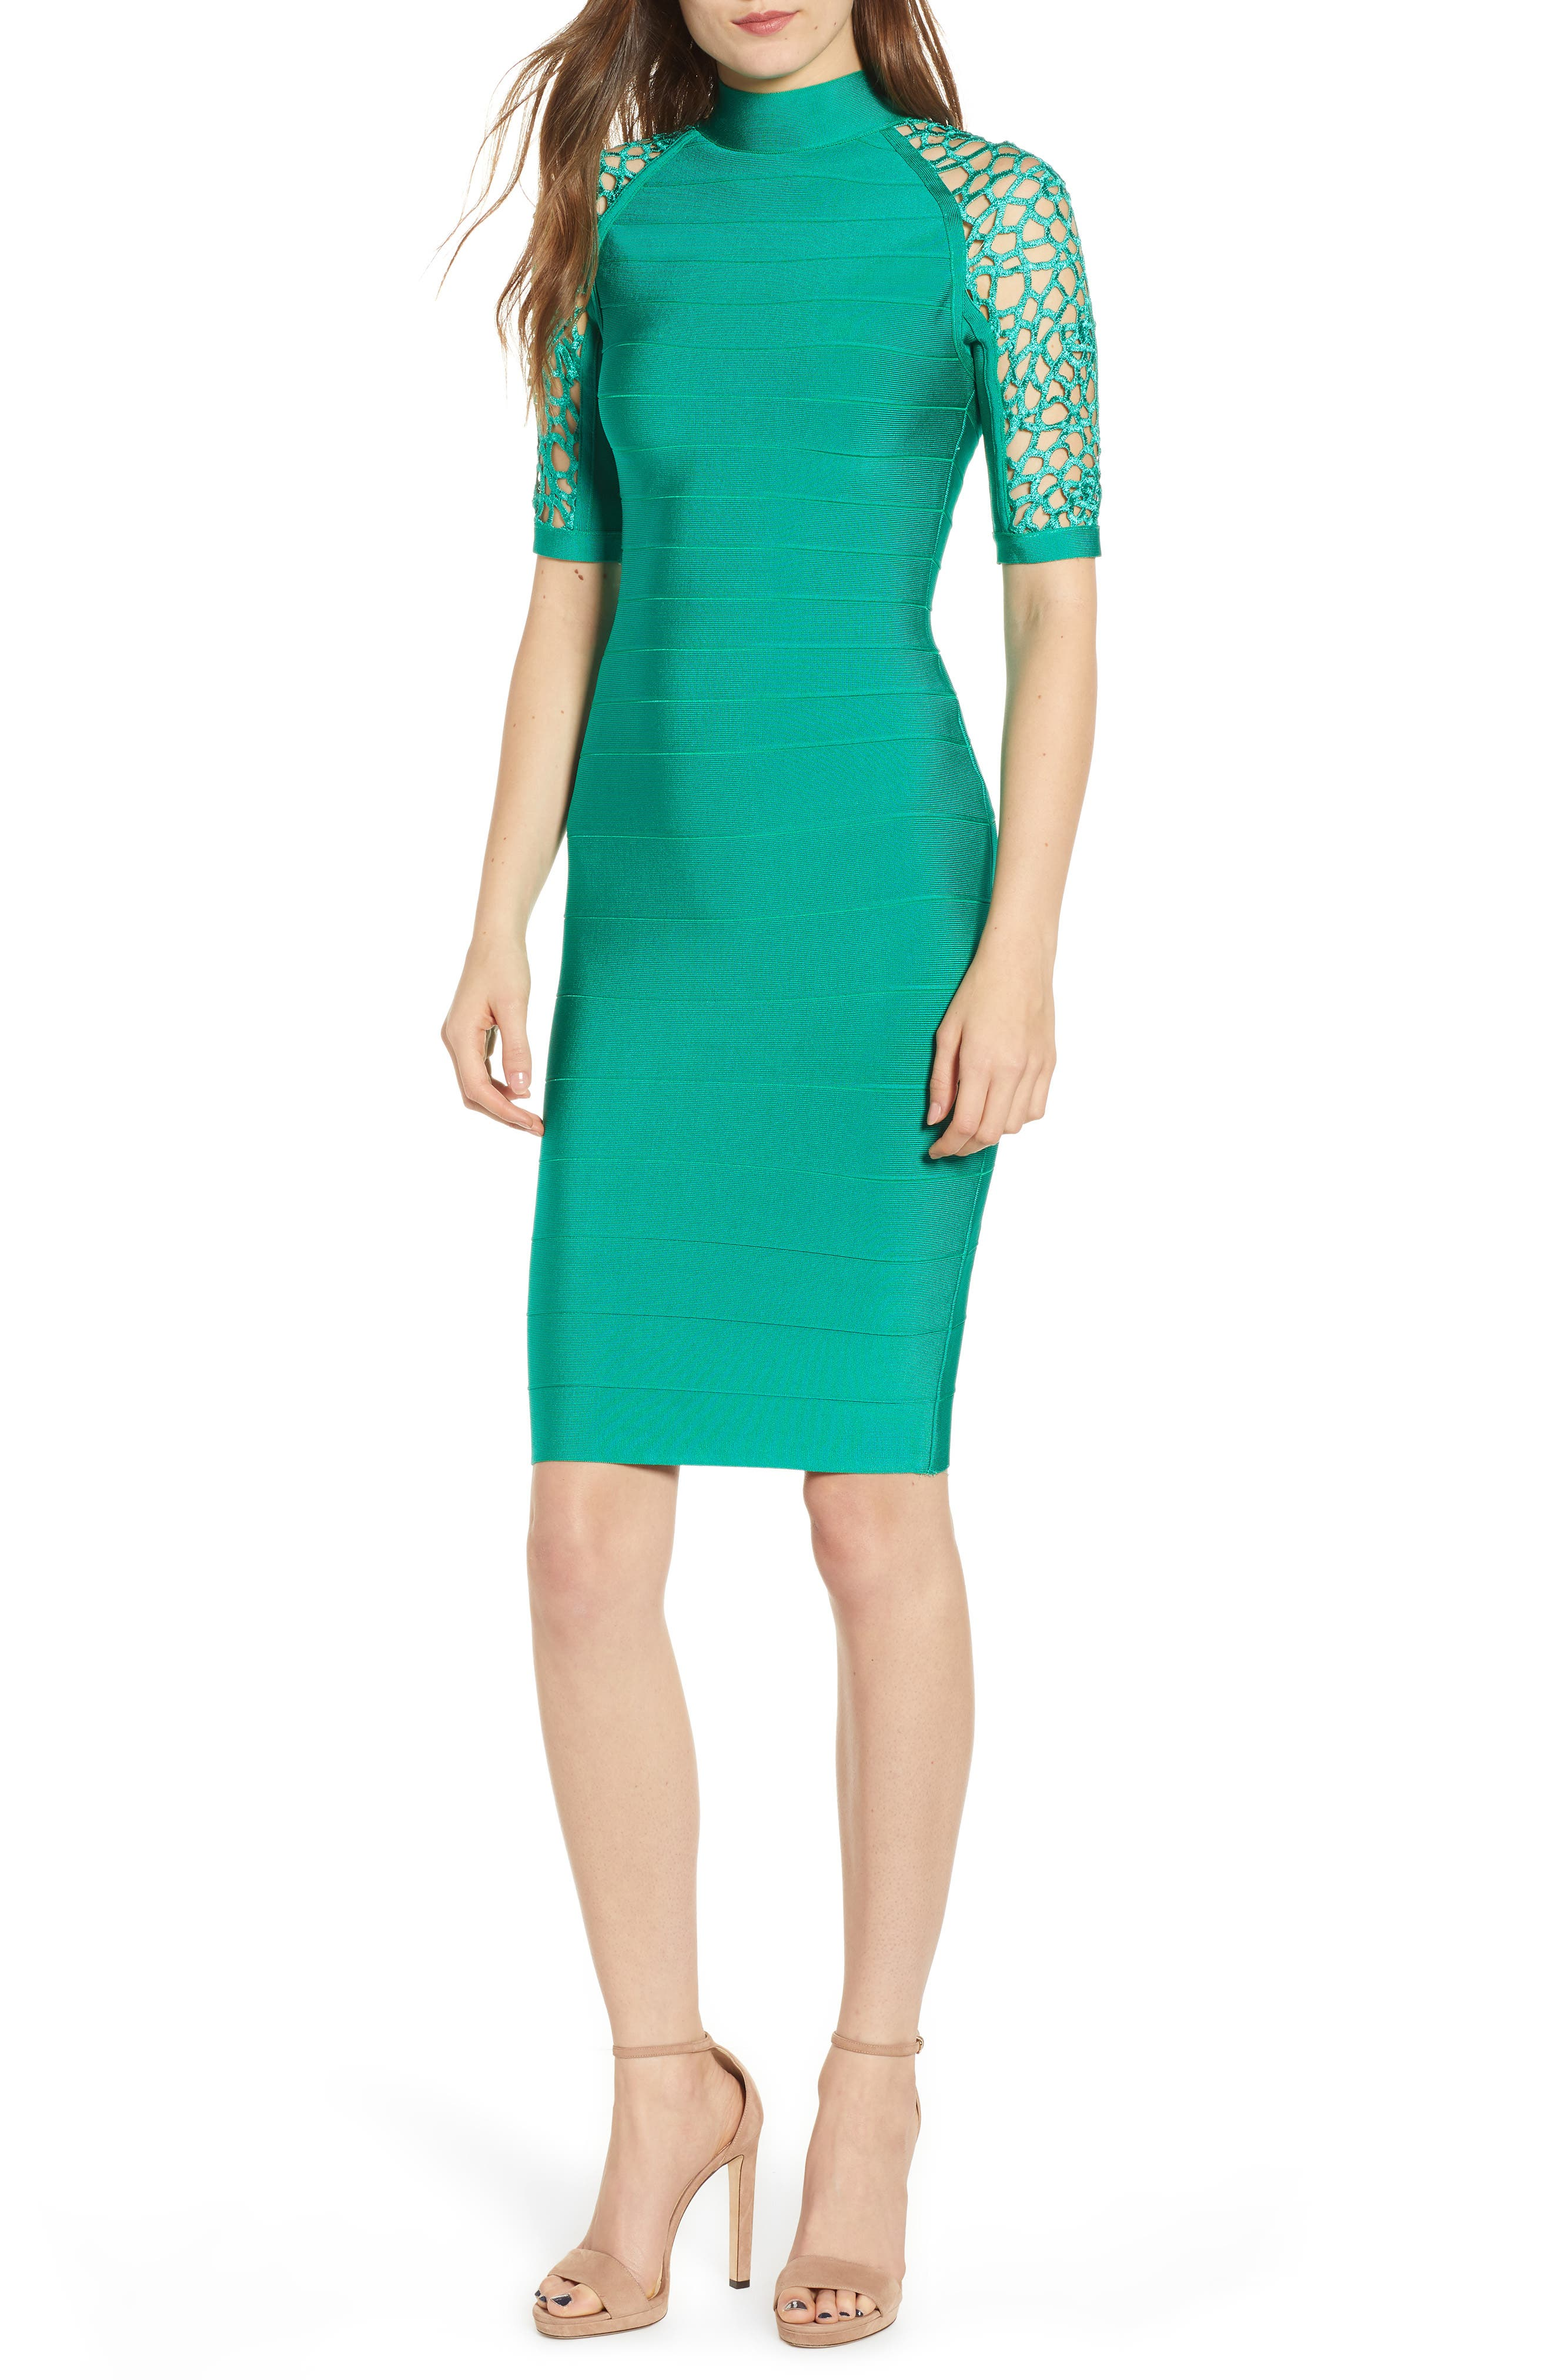 SENTIMENTAL NY,                             Bandage Body-Con Dress,                             Main thumbnail 1, color,                             GREEN